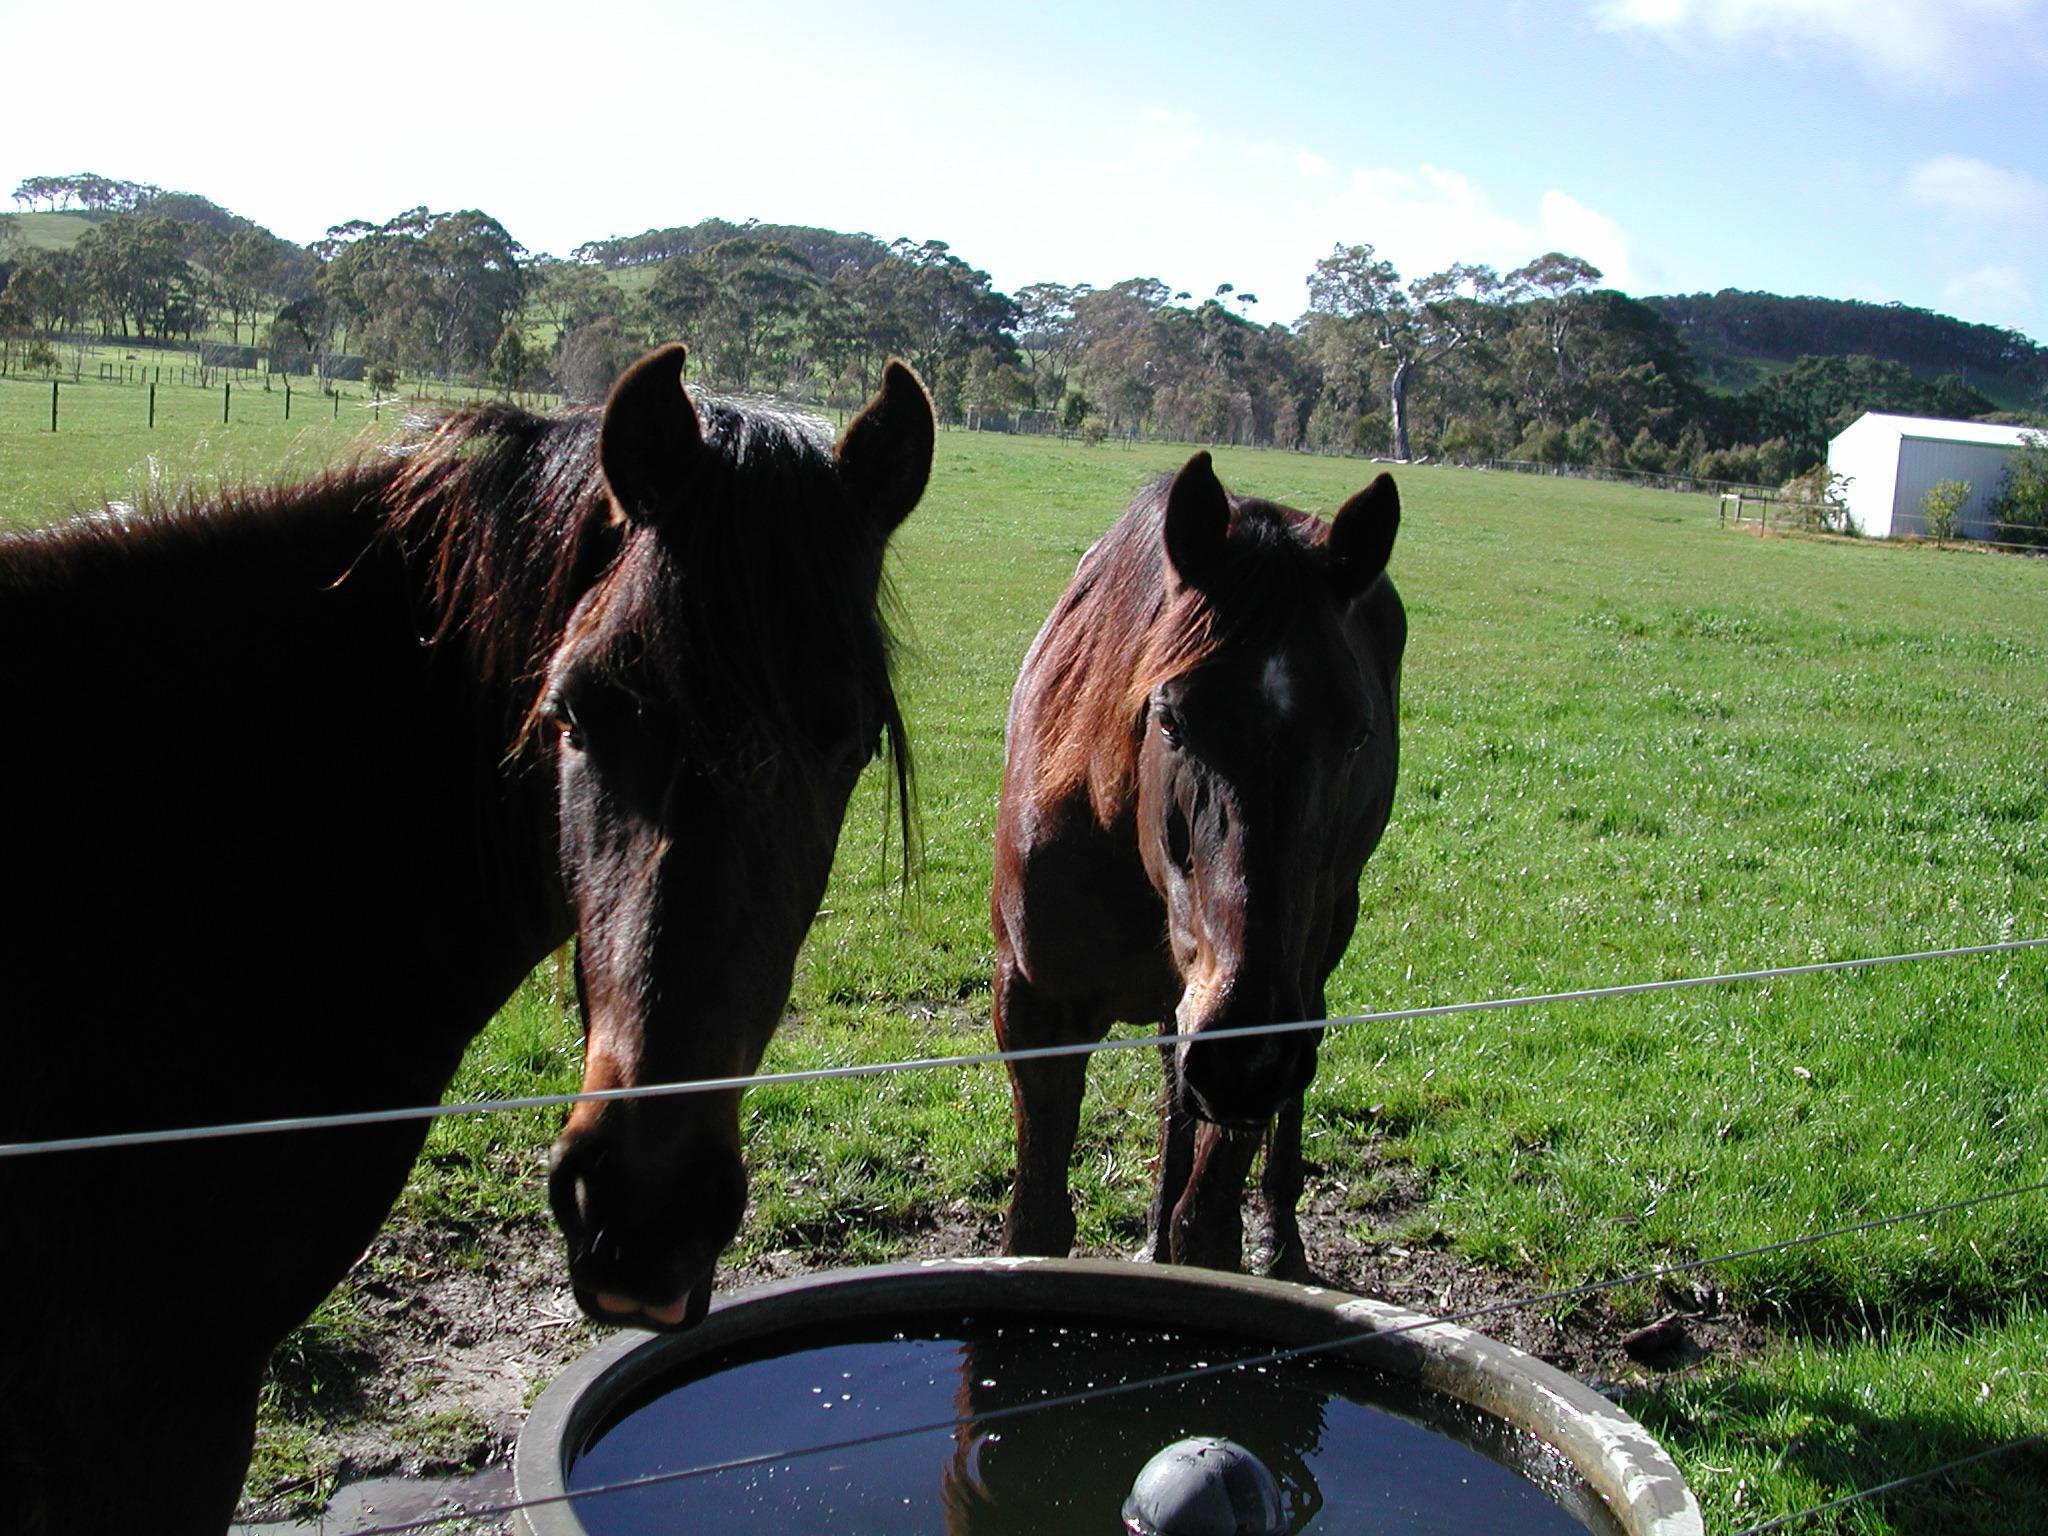 Horses-11.jpeg